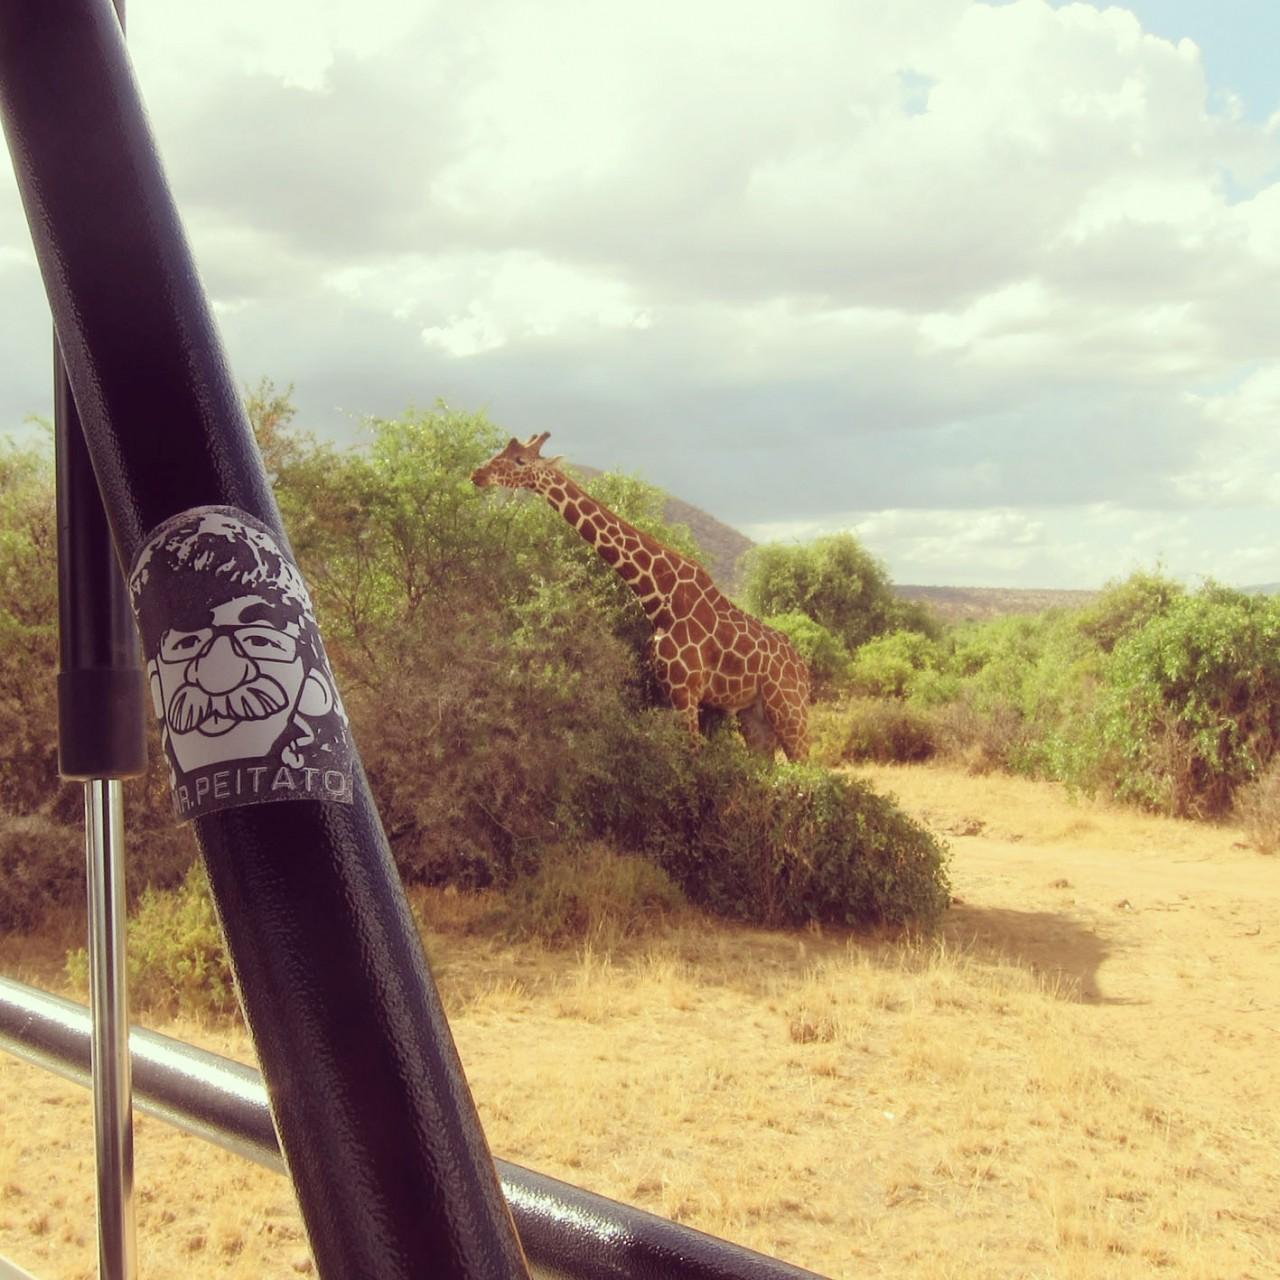 Peipegata sticker slap stickerart  bombardeando Sudafrica